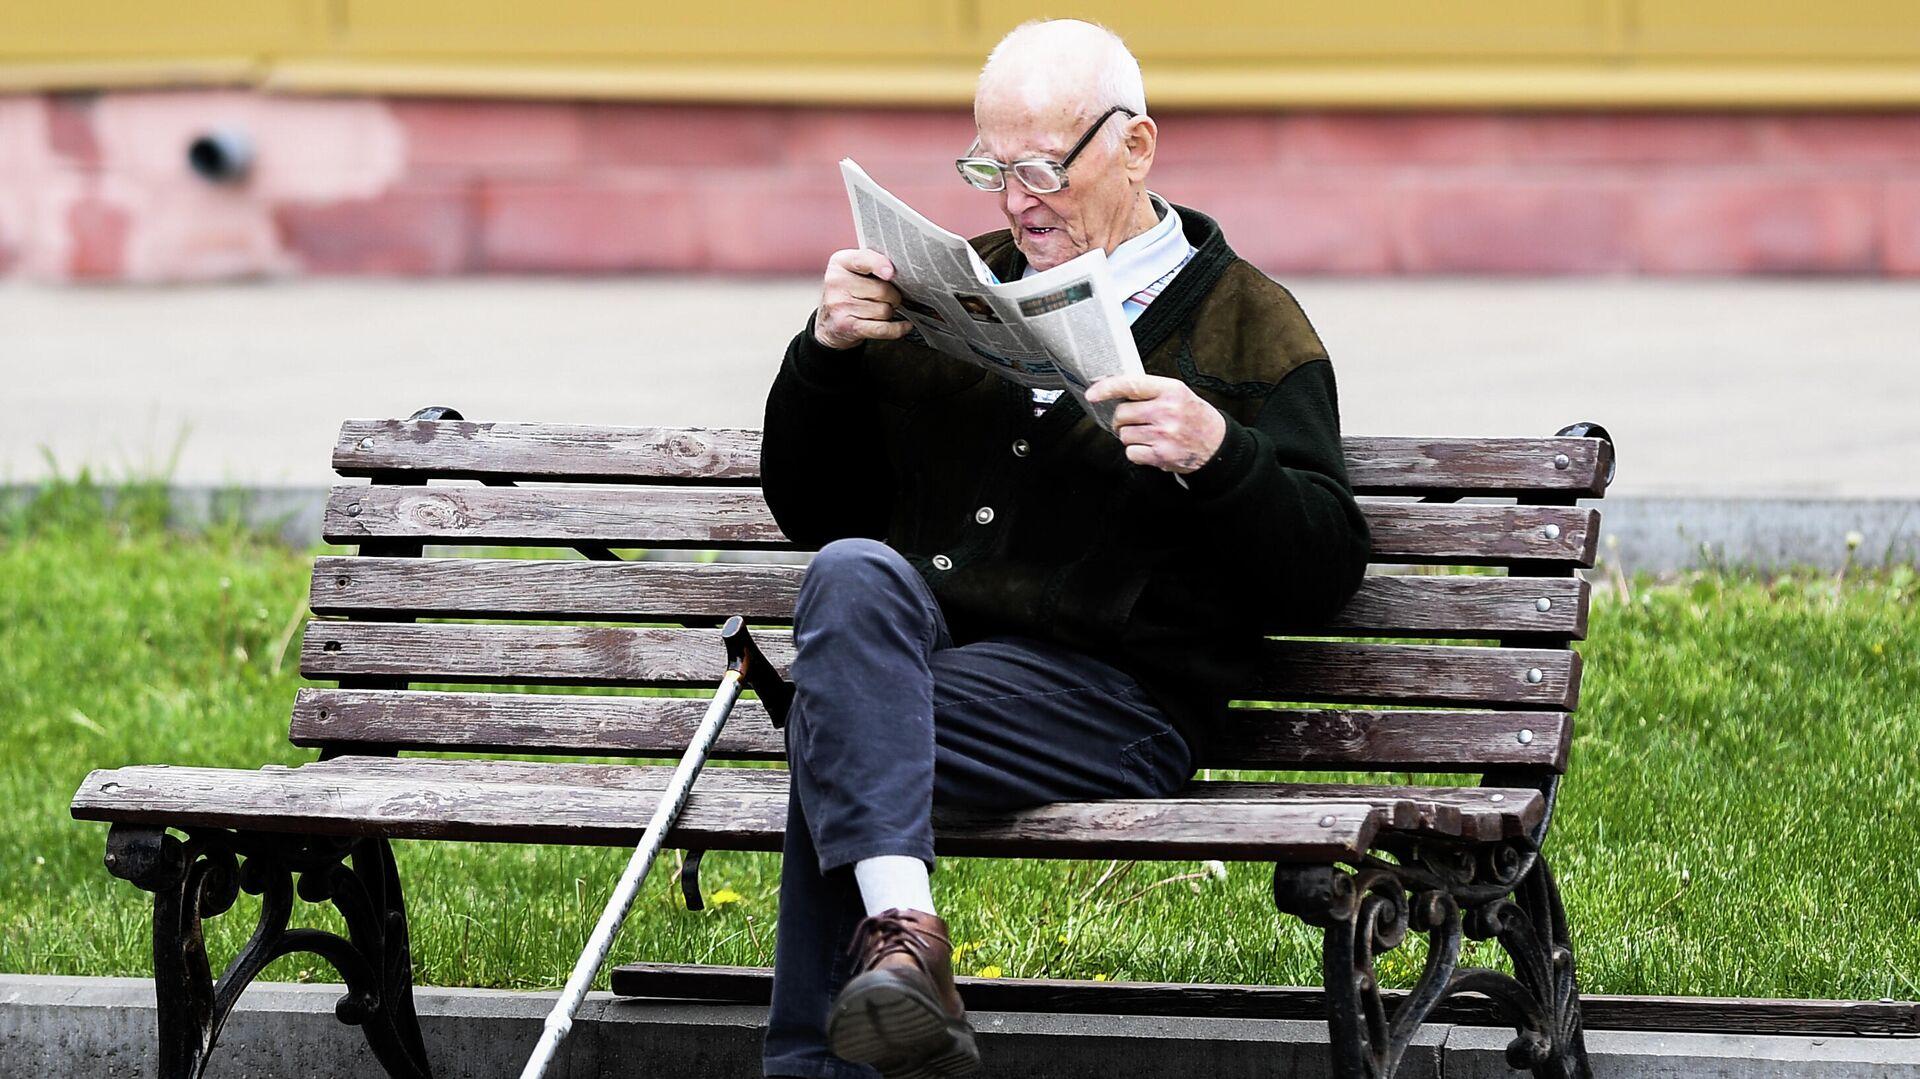 Мужчина читает газету на улице на лавочке в Москве - РИА Новости, 1920, 20.08.2020